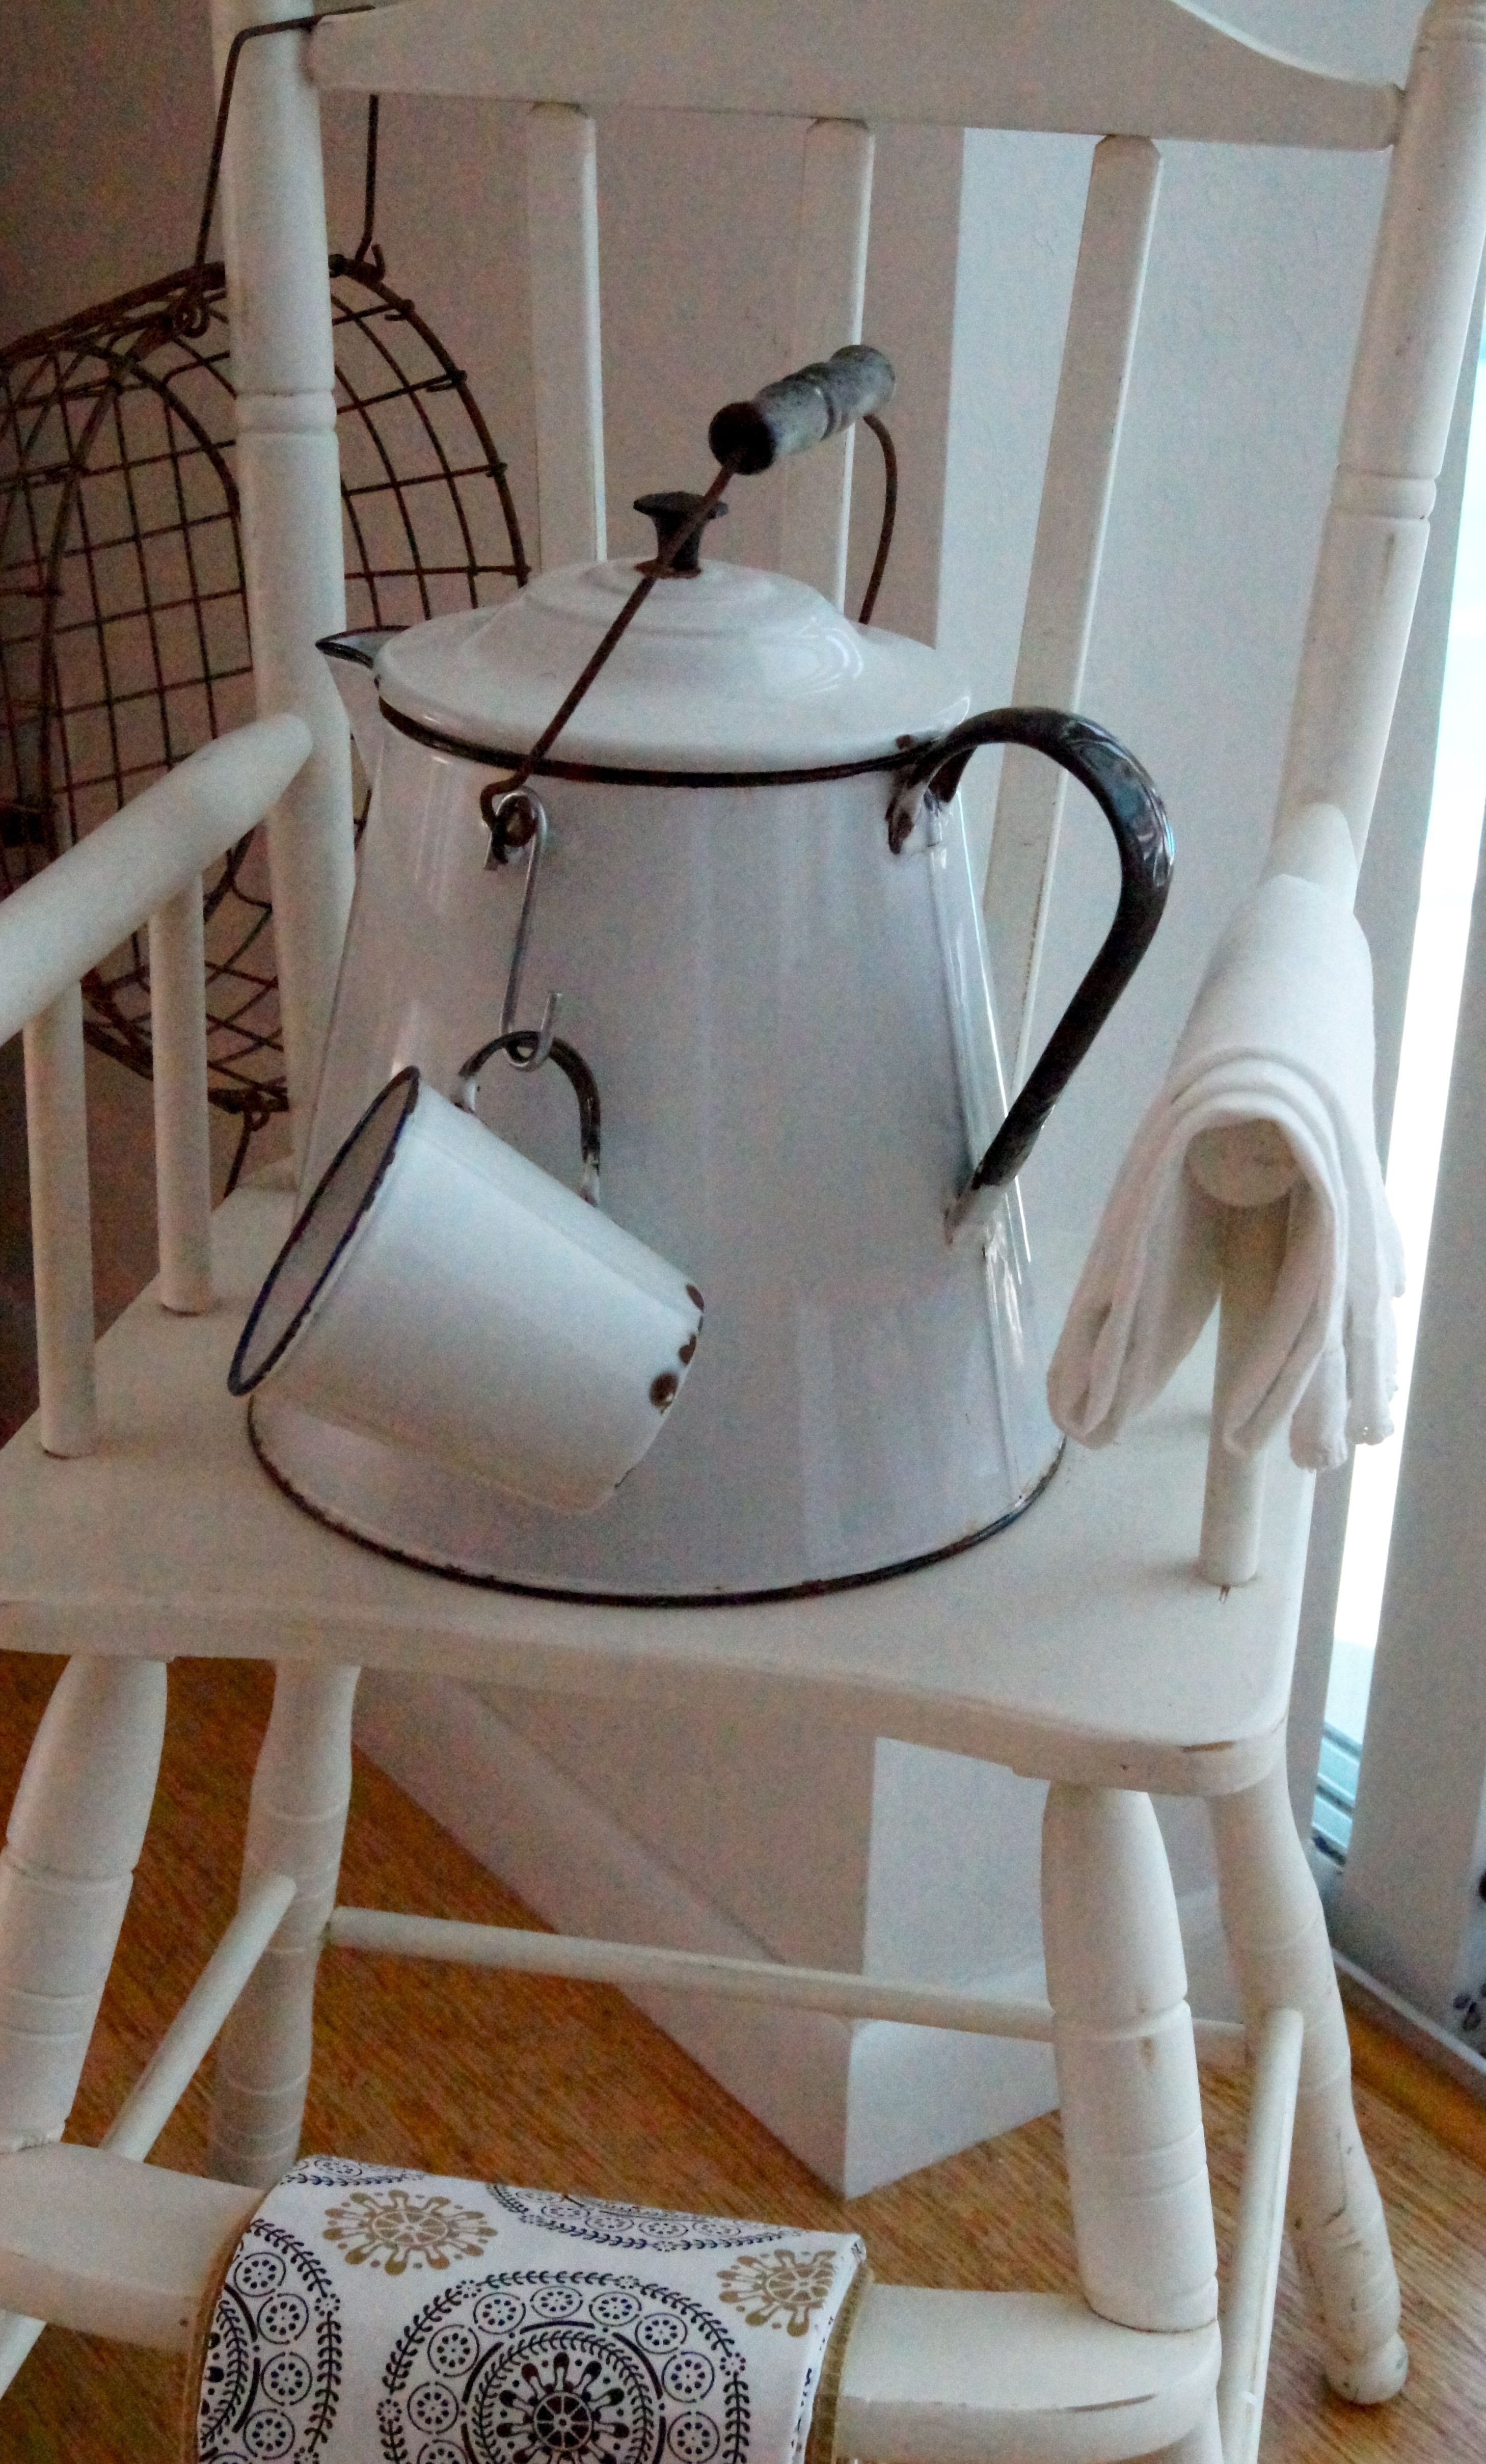 enamelware coffee pot with cup emaille pinterest emaille teekanne und kaffeekanne. Black Bedroom Furniture Sets. Home Design Ideas